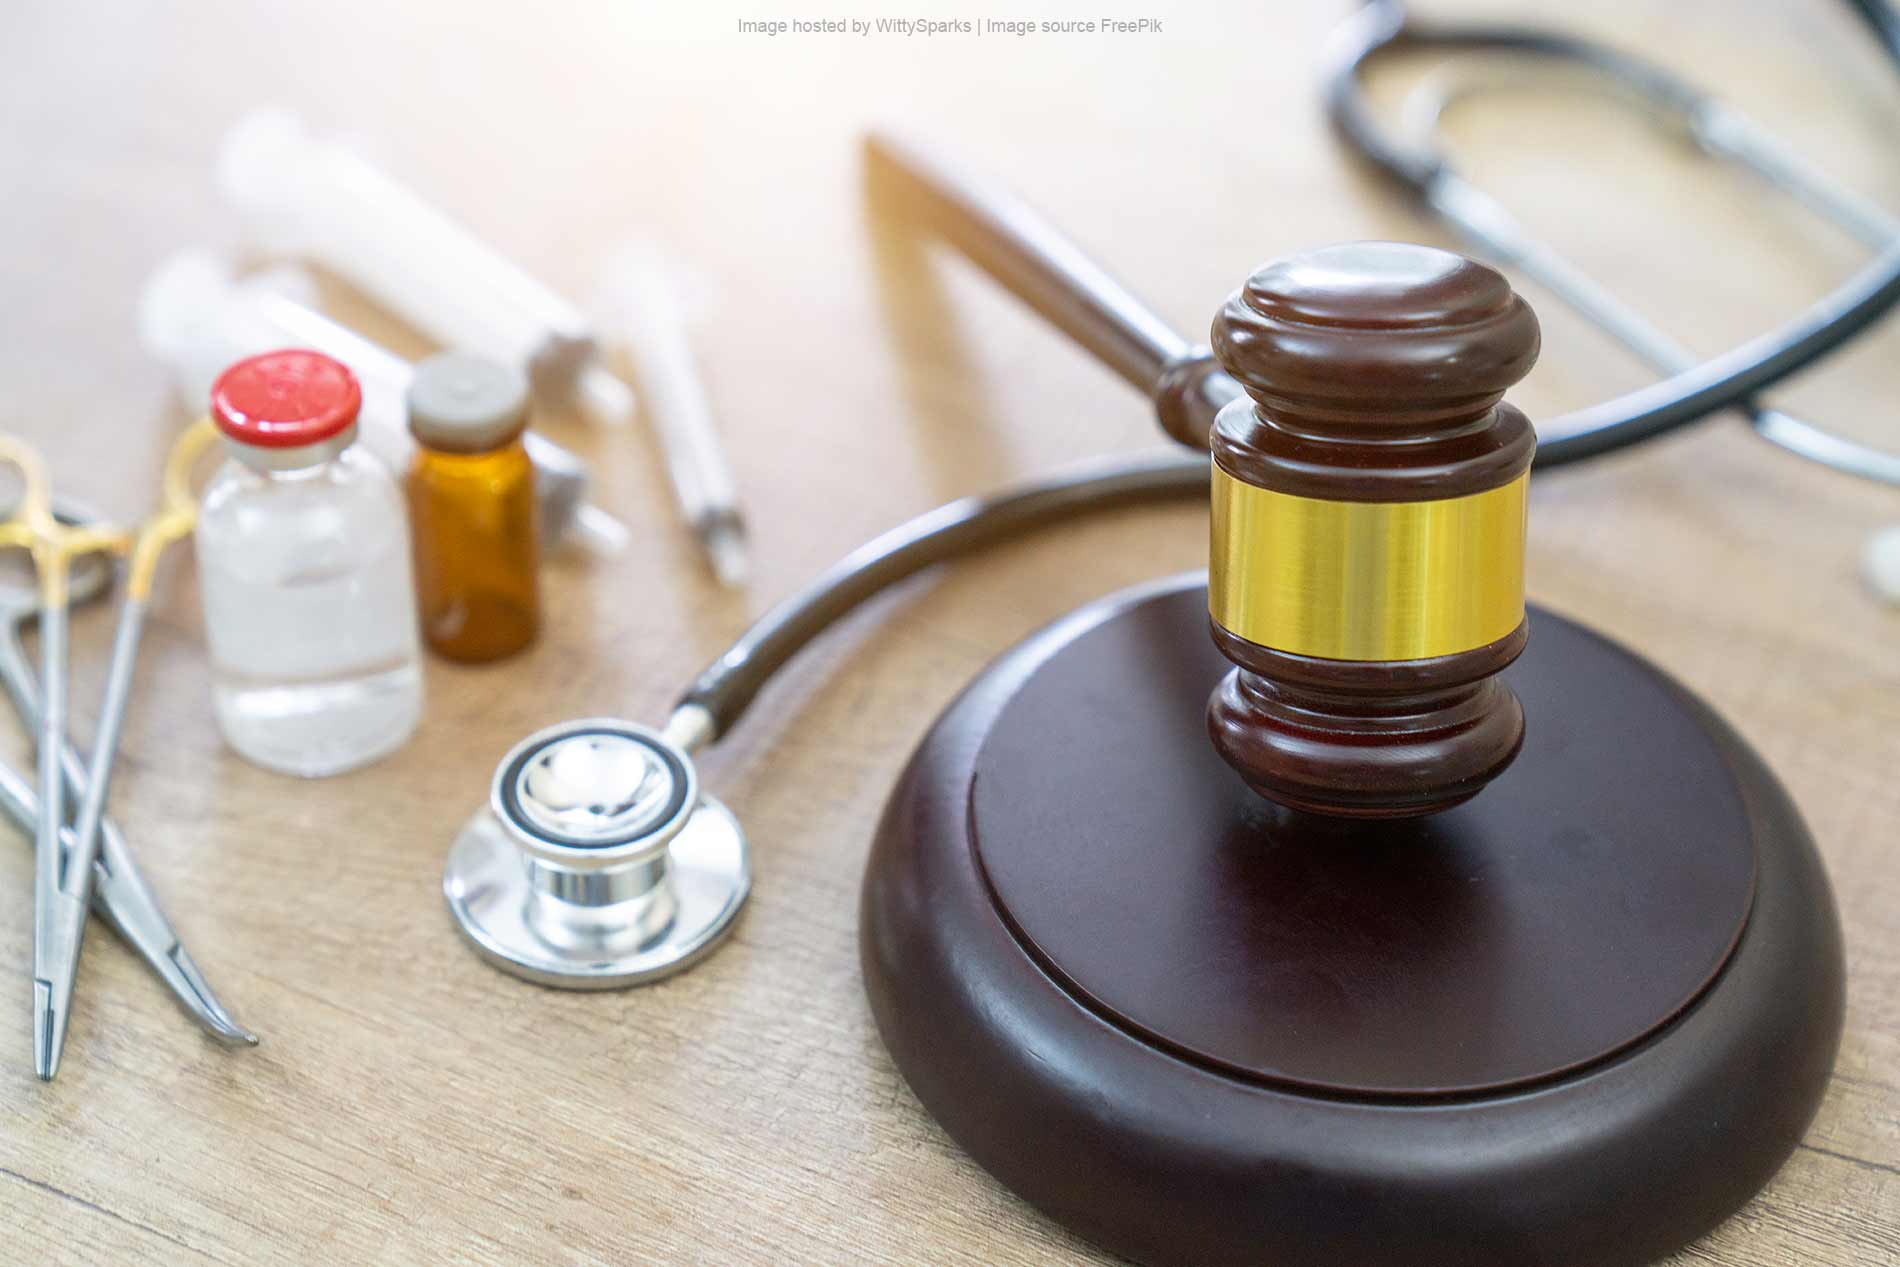 Medical Malpractice - Gavel and Stethoscope